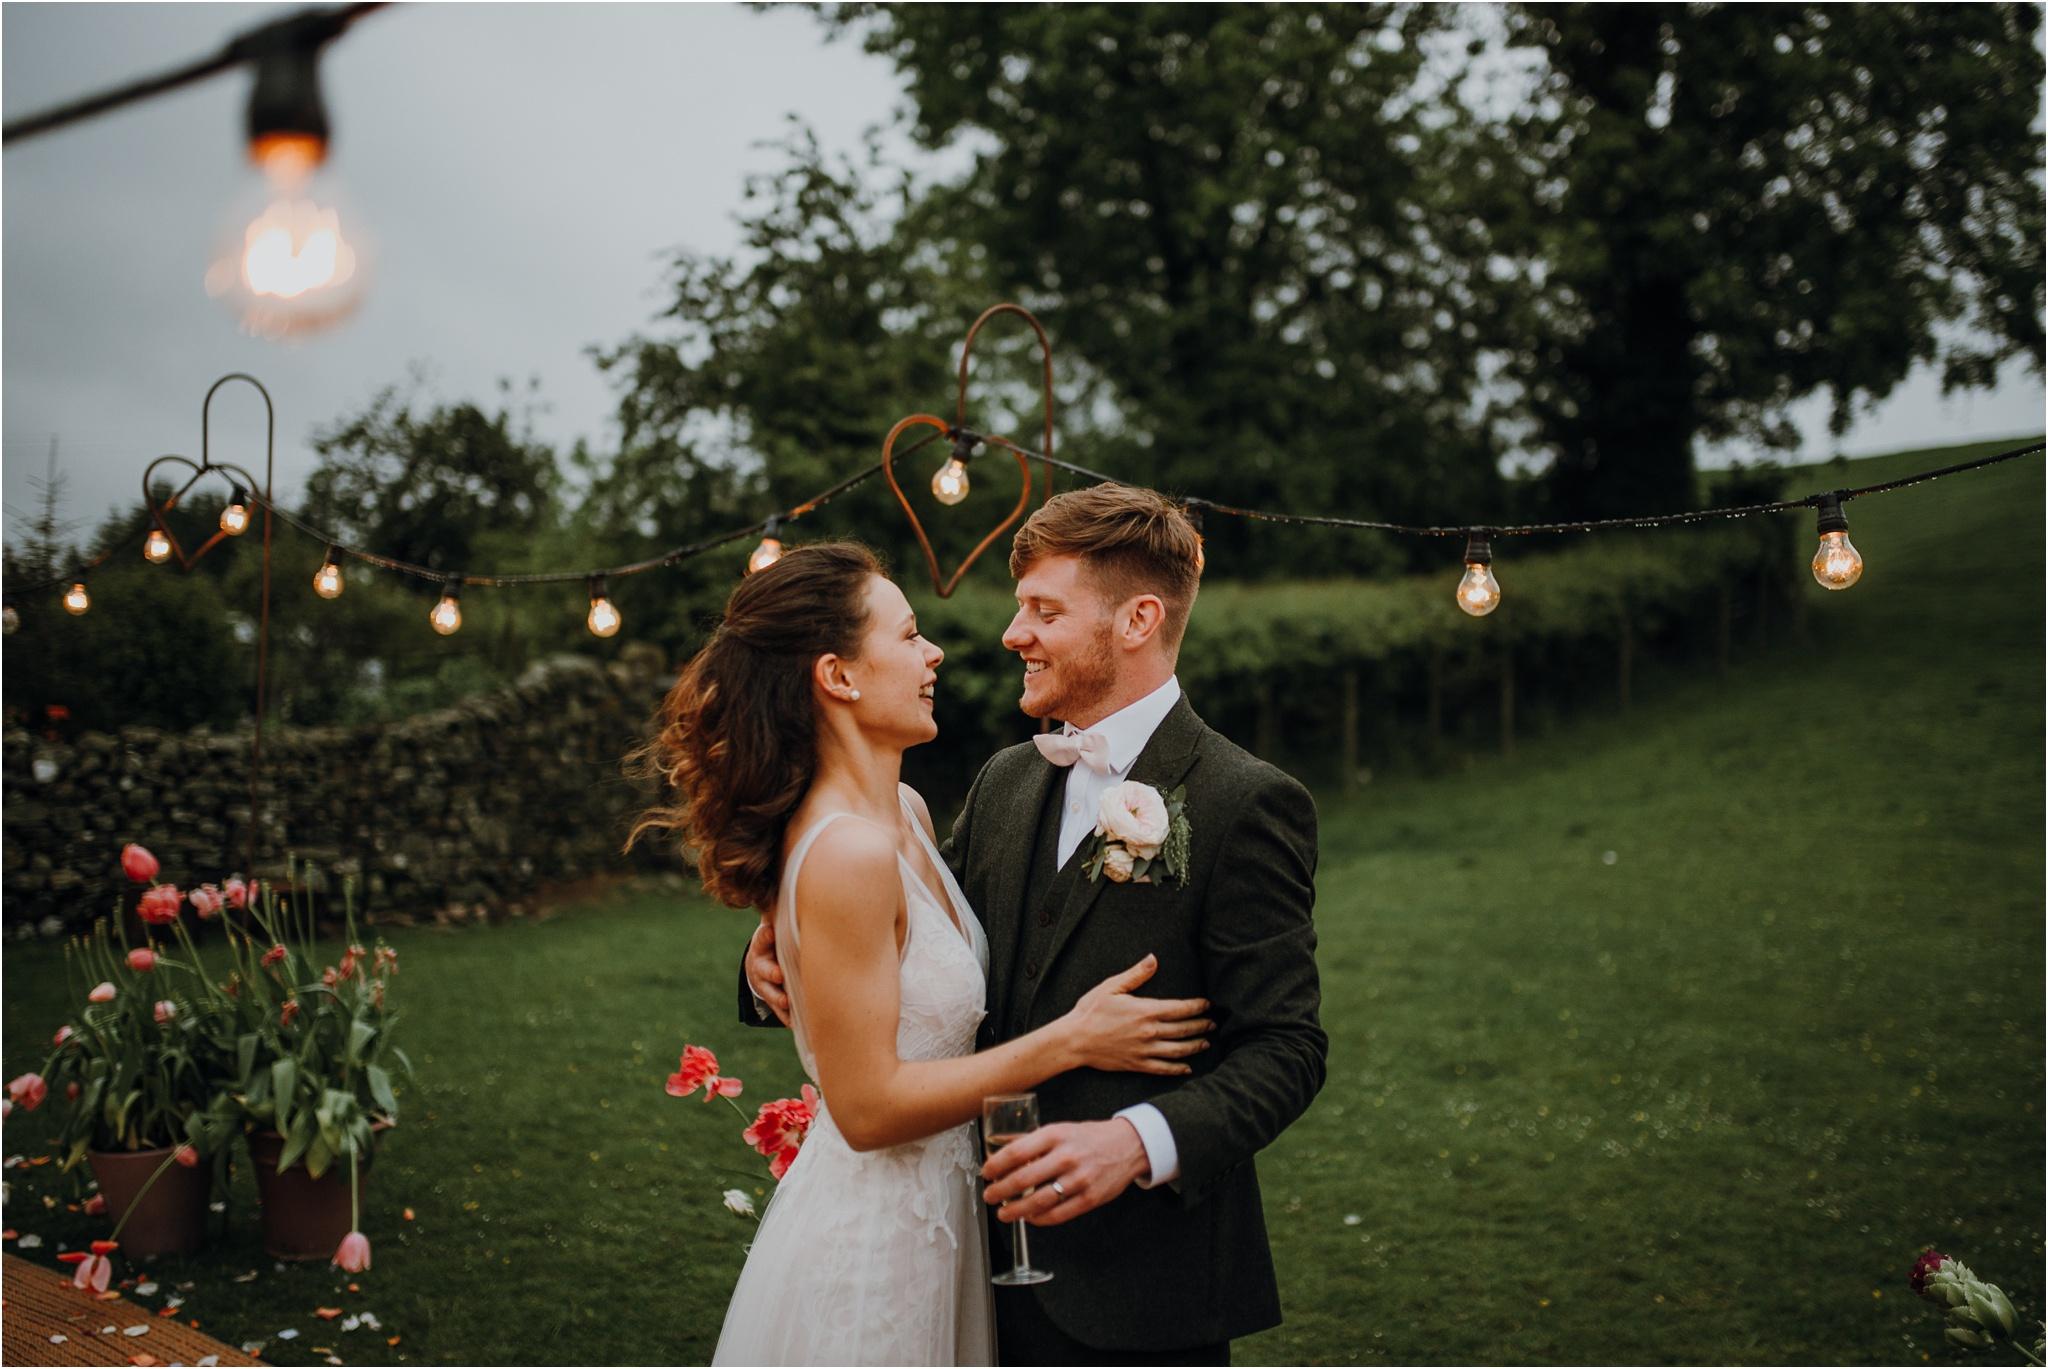 Outdoor-country-wedding-Edinburgh-photographer__0250.jpg